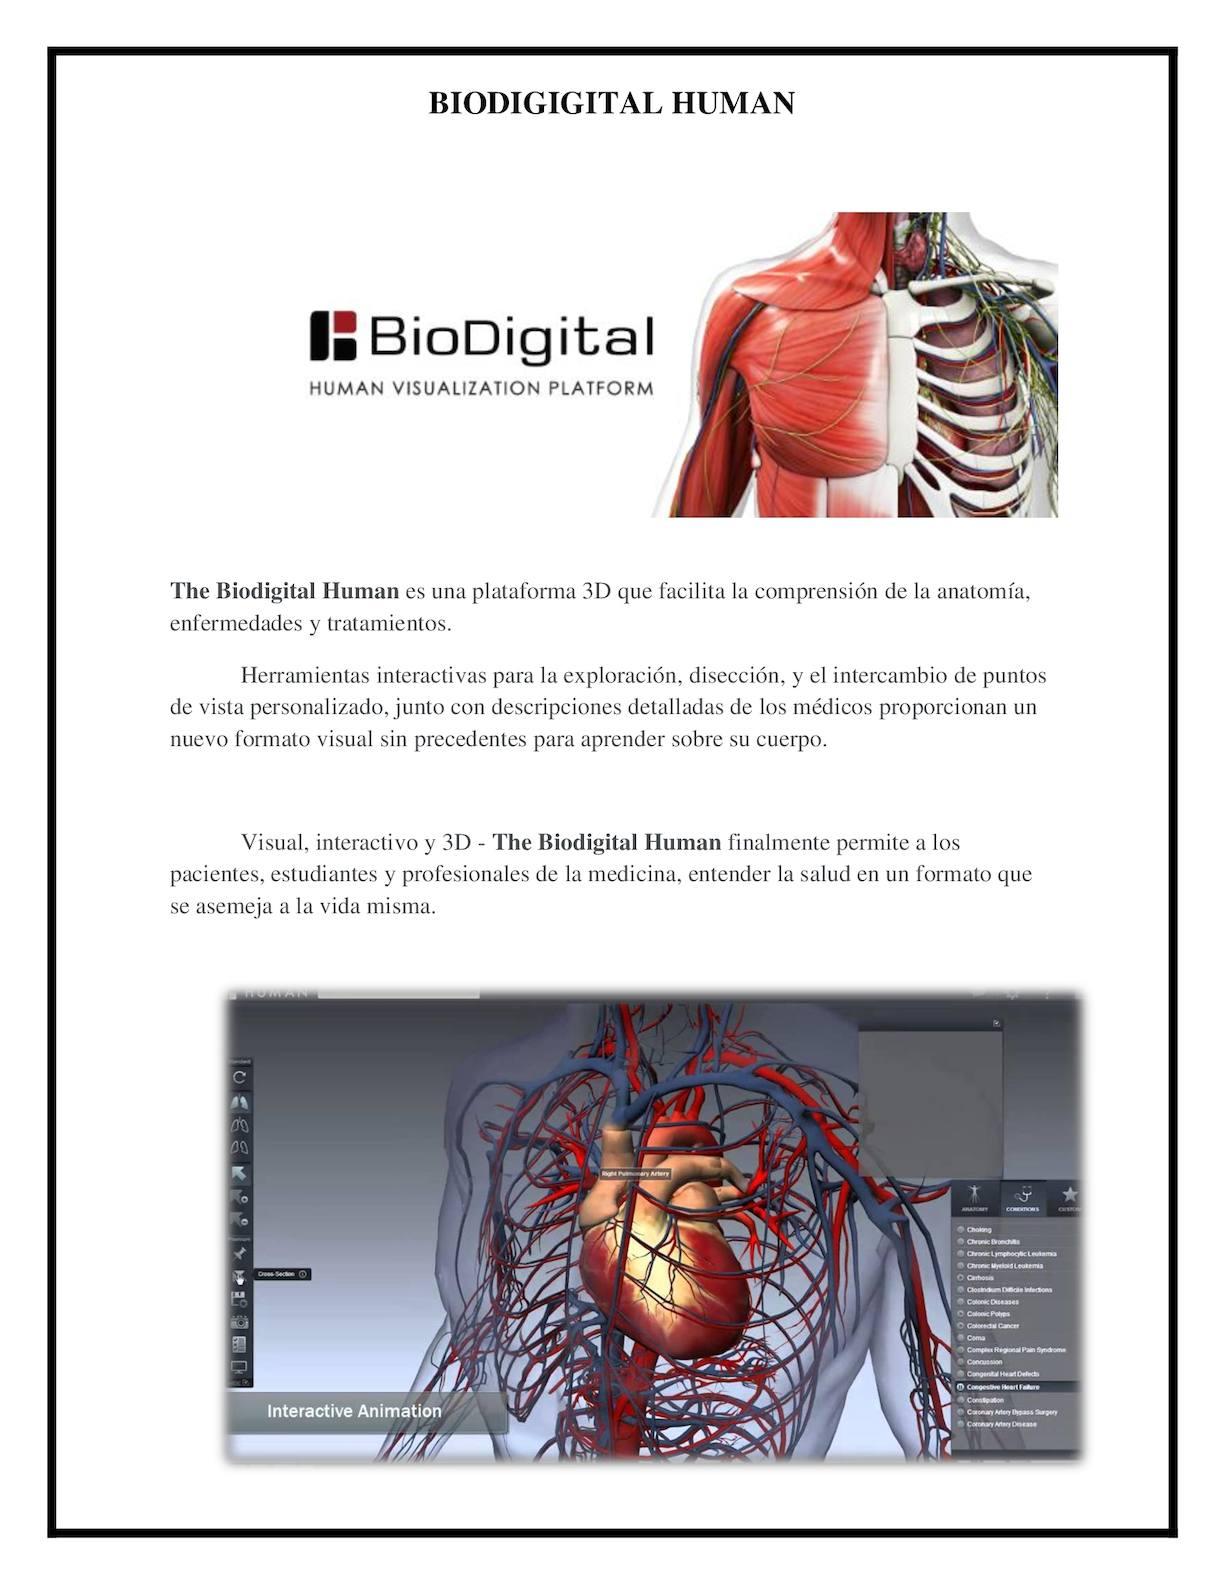 Calaméo - Biodigigital Human